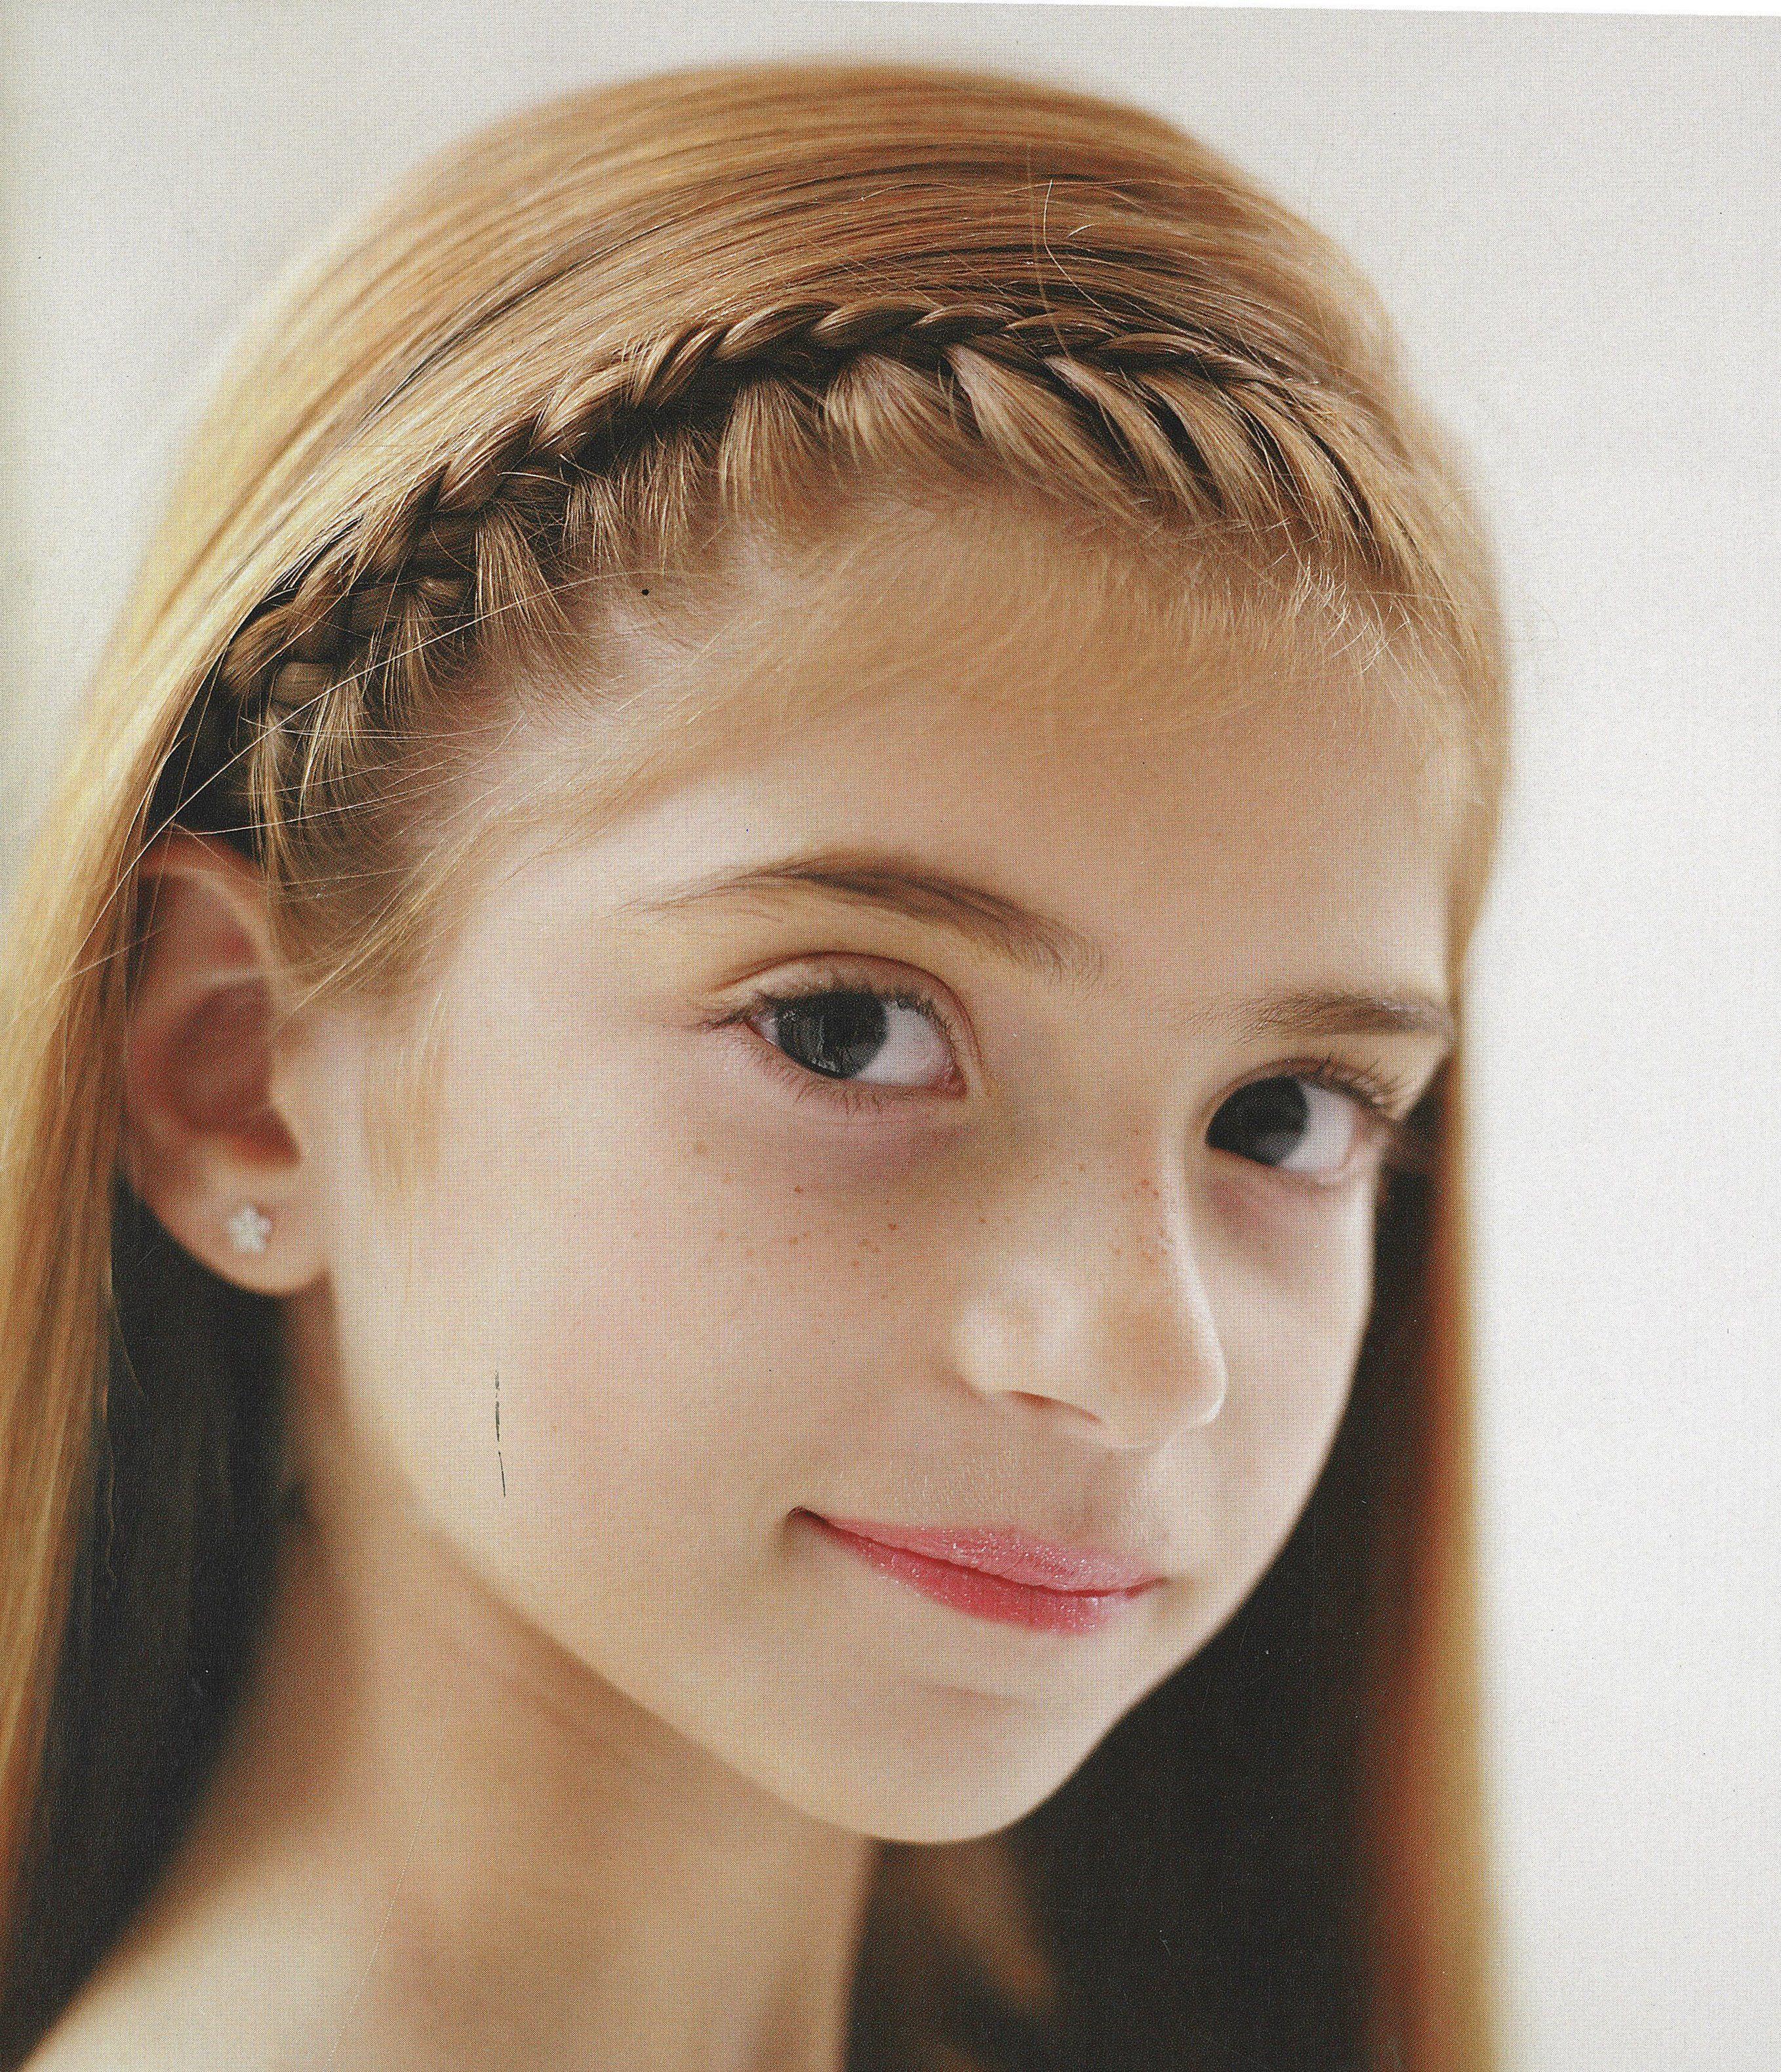 Sensational Recital Dance Recital And Little Girl Hairstyles On Pinterest Short Hairstyles Gunalazisus